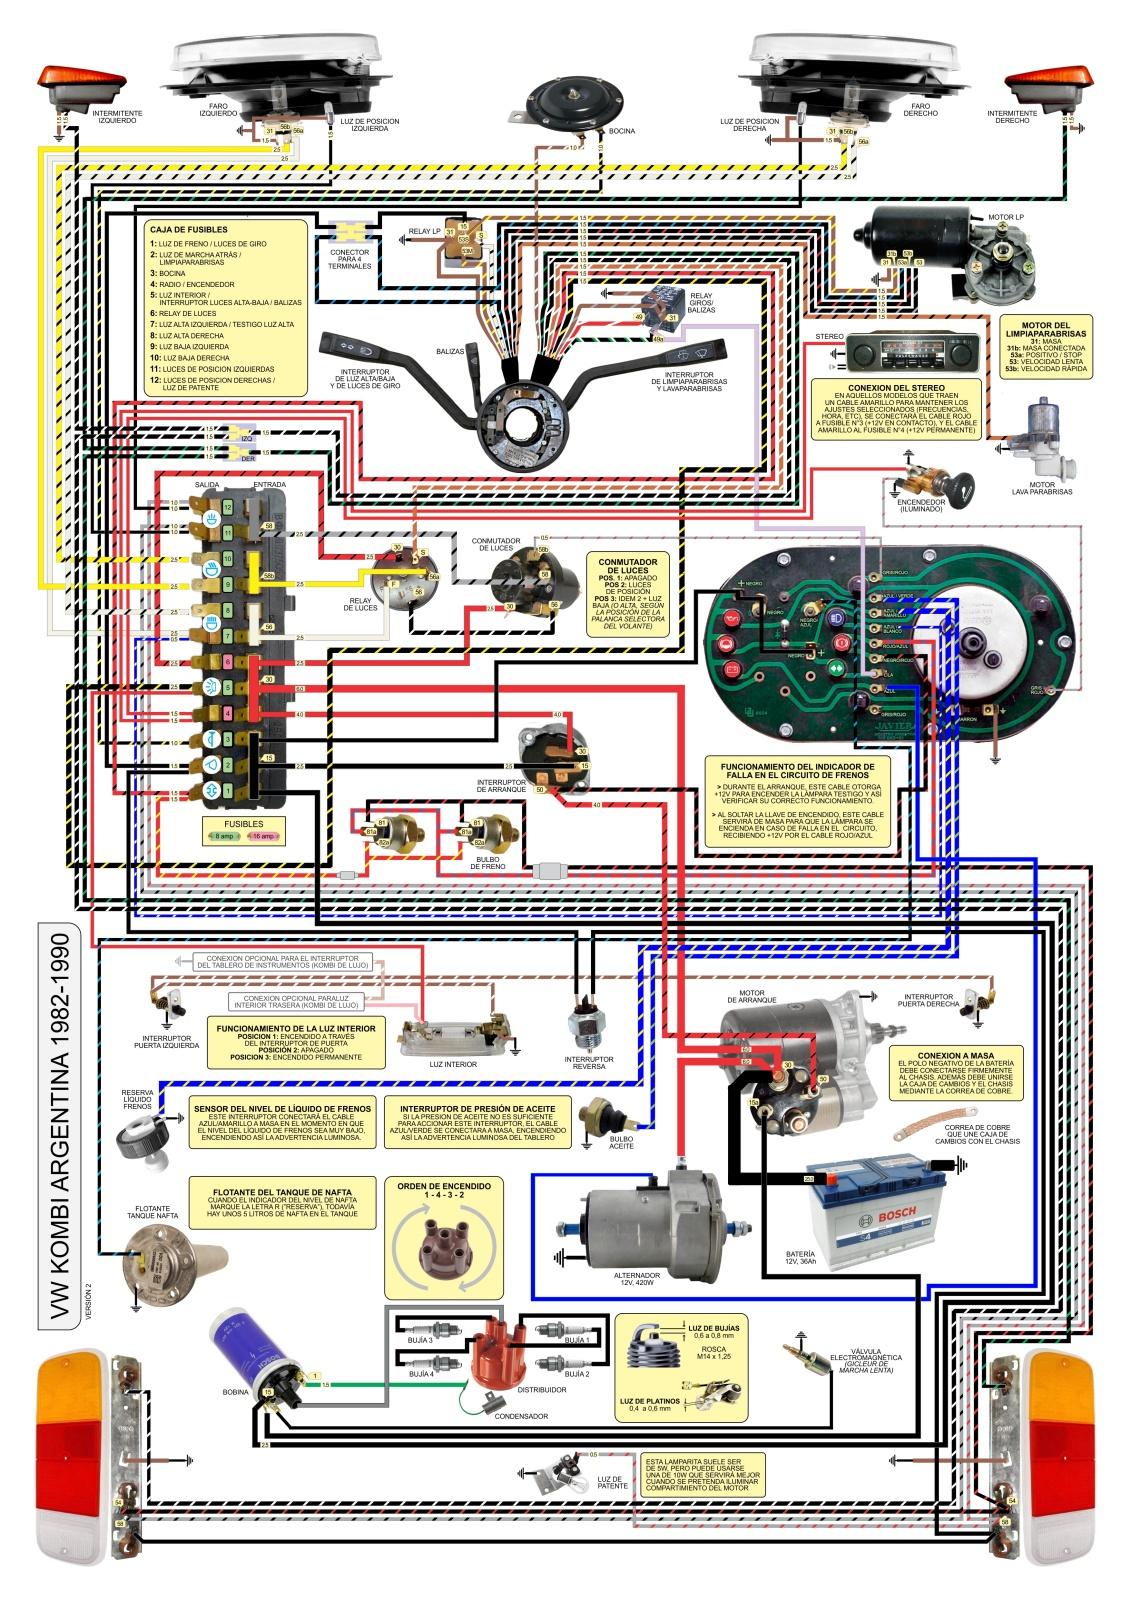 Diagrama electrico de Kombi. Un aporte 122p05w